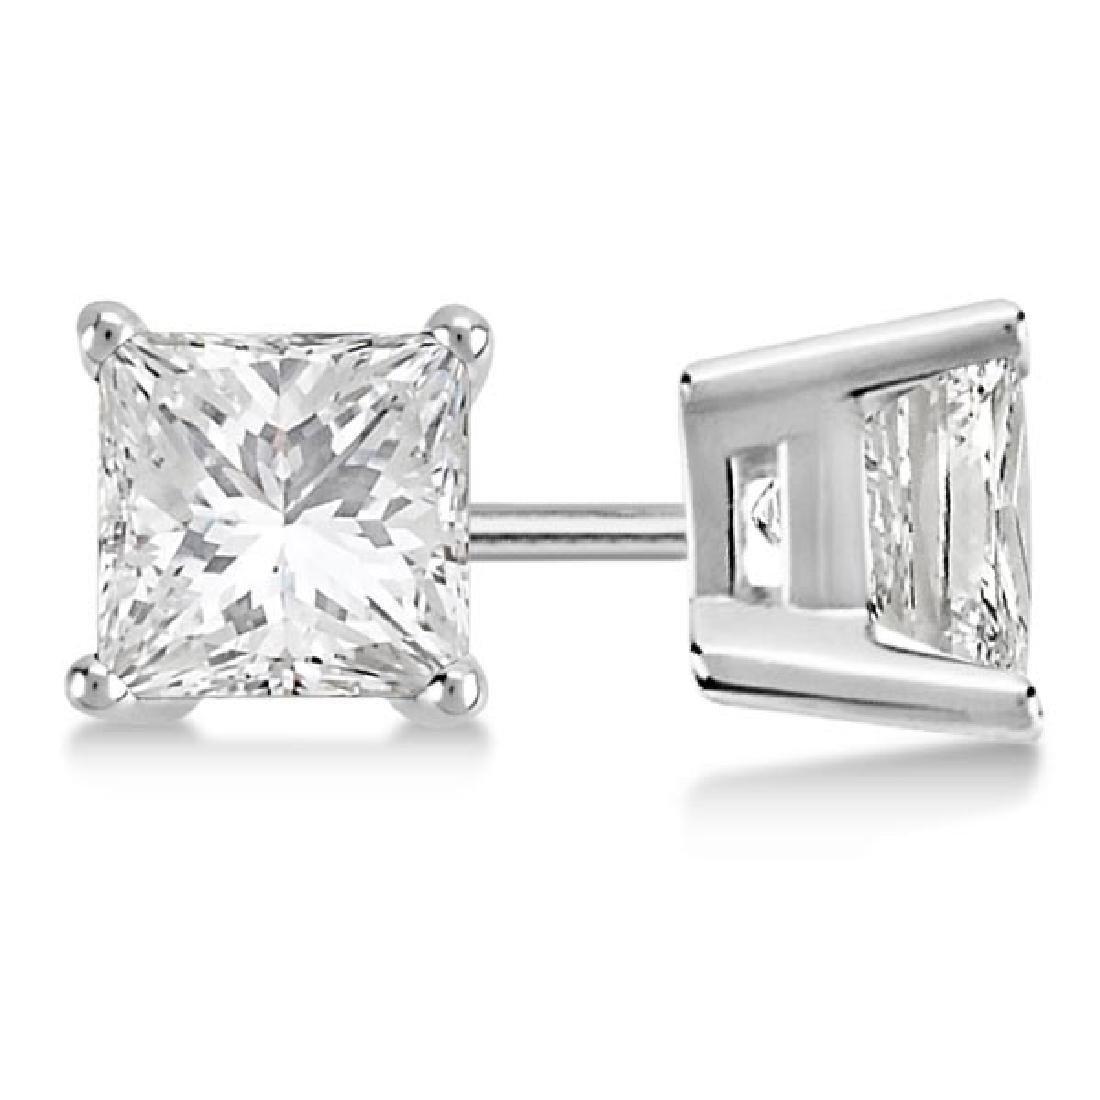 Certified 1.16 CTW Princess Diamond Stud Earrings F/SI2